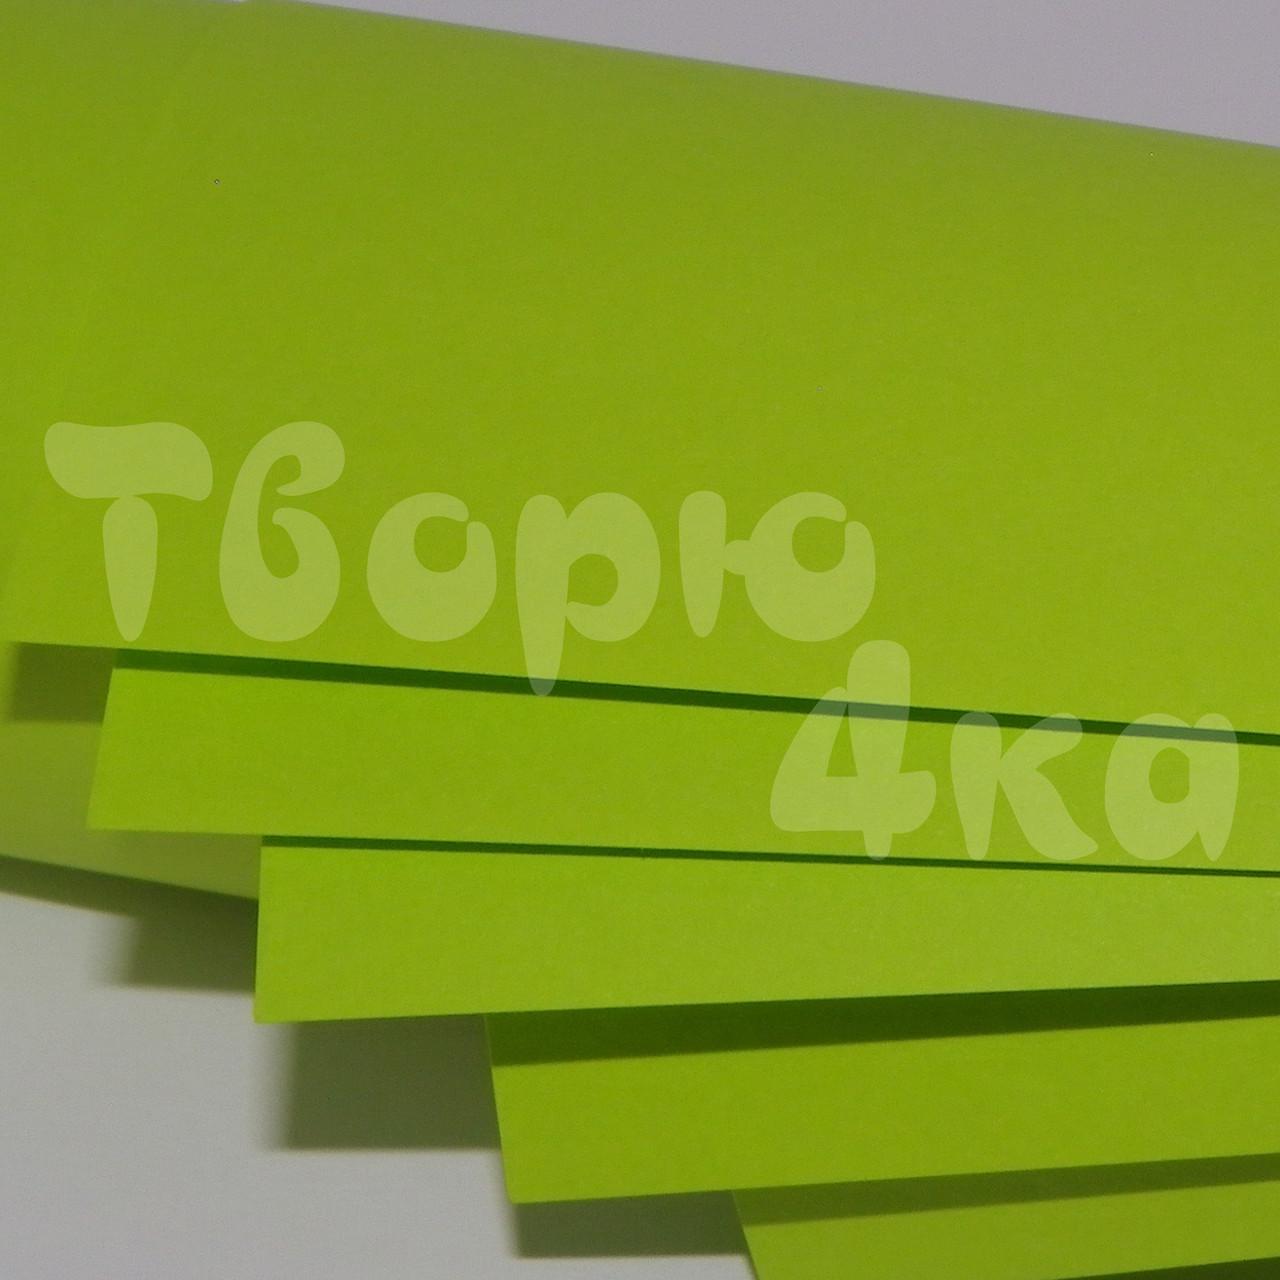 Бумага цветная А4 80 гр/м.кв cyber green (кислотный зеленый)